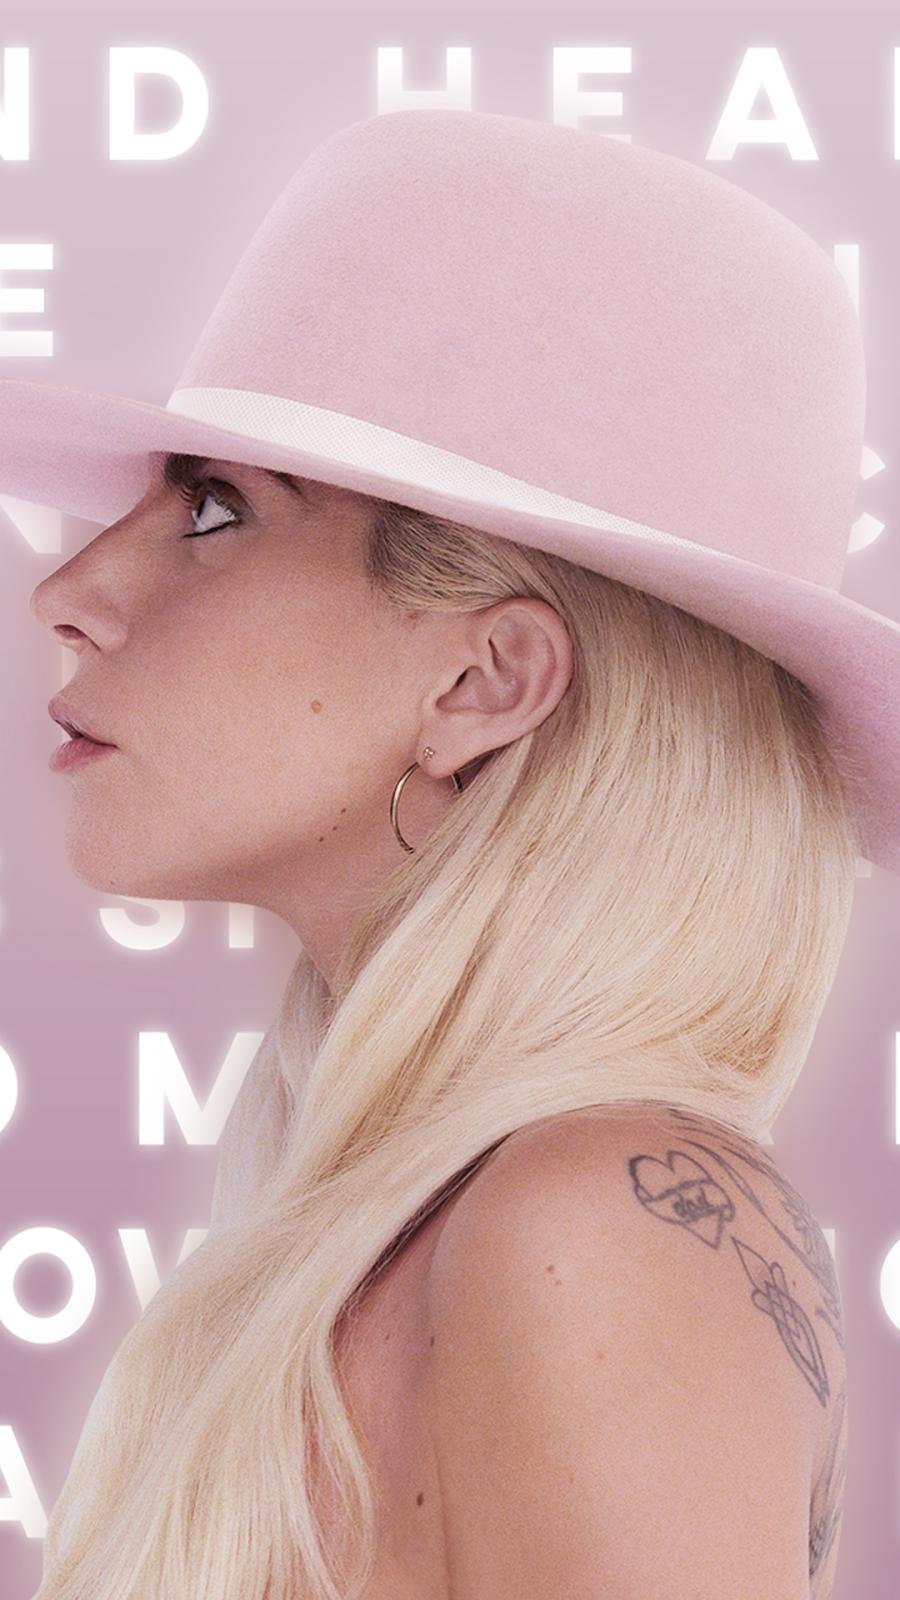 ... Lady Gaga Joanne Wallpaper Iphone The Best HD Wallpaper